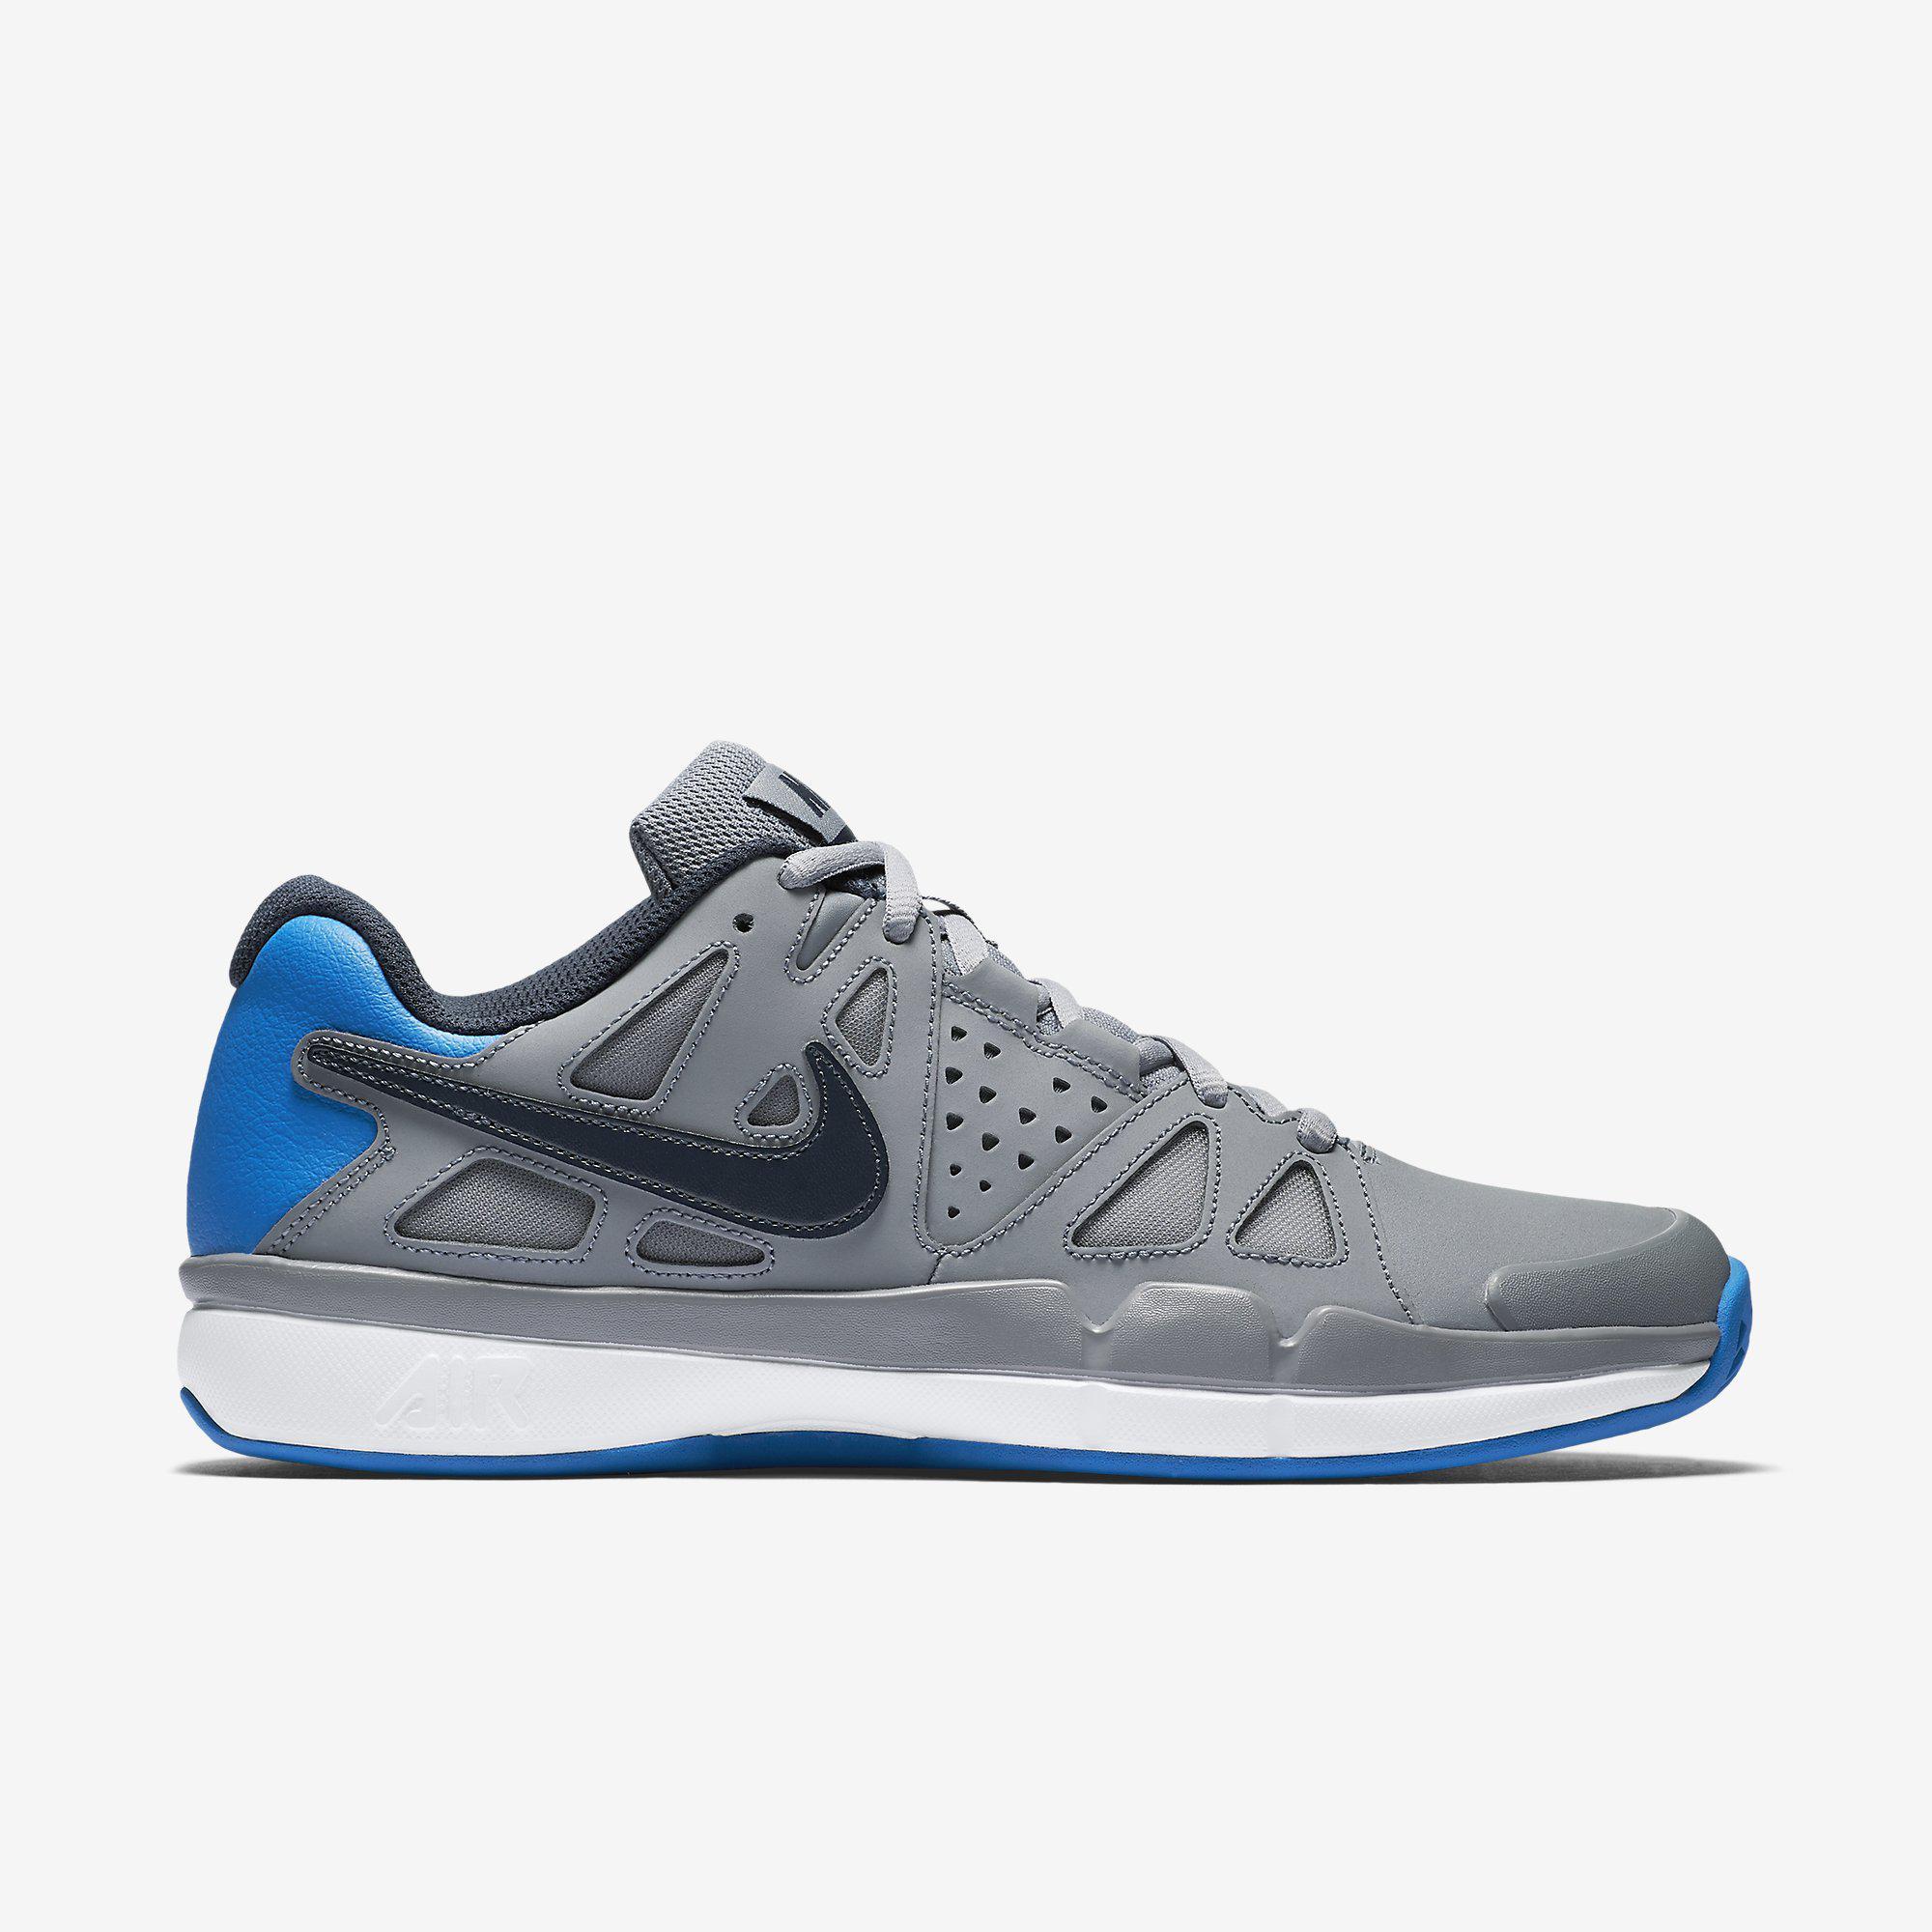 7ff43e455efd3 Nike Mens Air Vapor Advantage Clay Court Tennis Shoes - Grey -  Tennisnuts.com